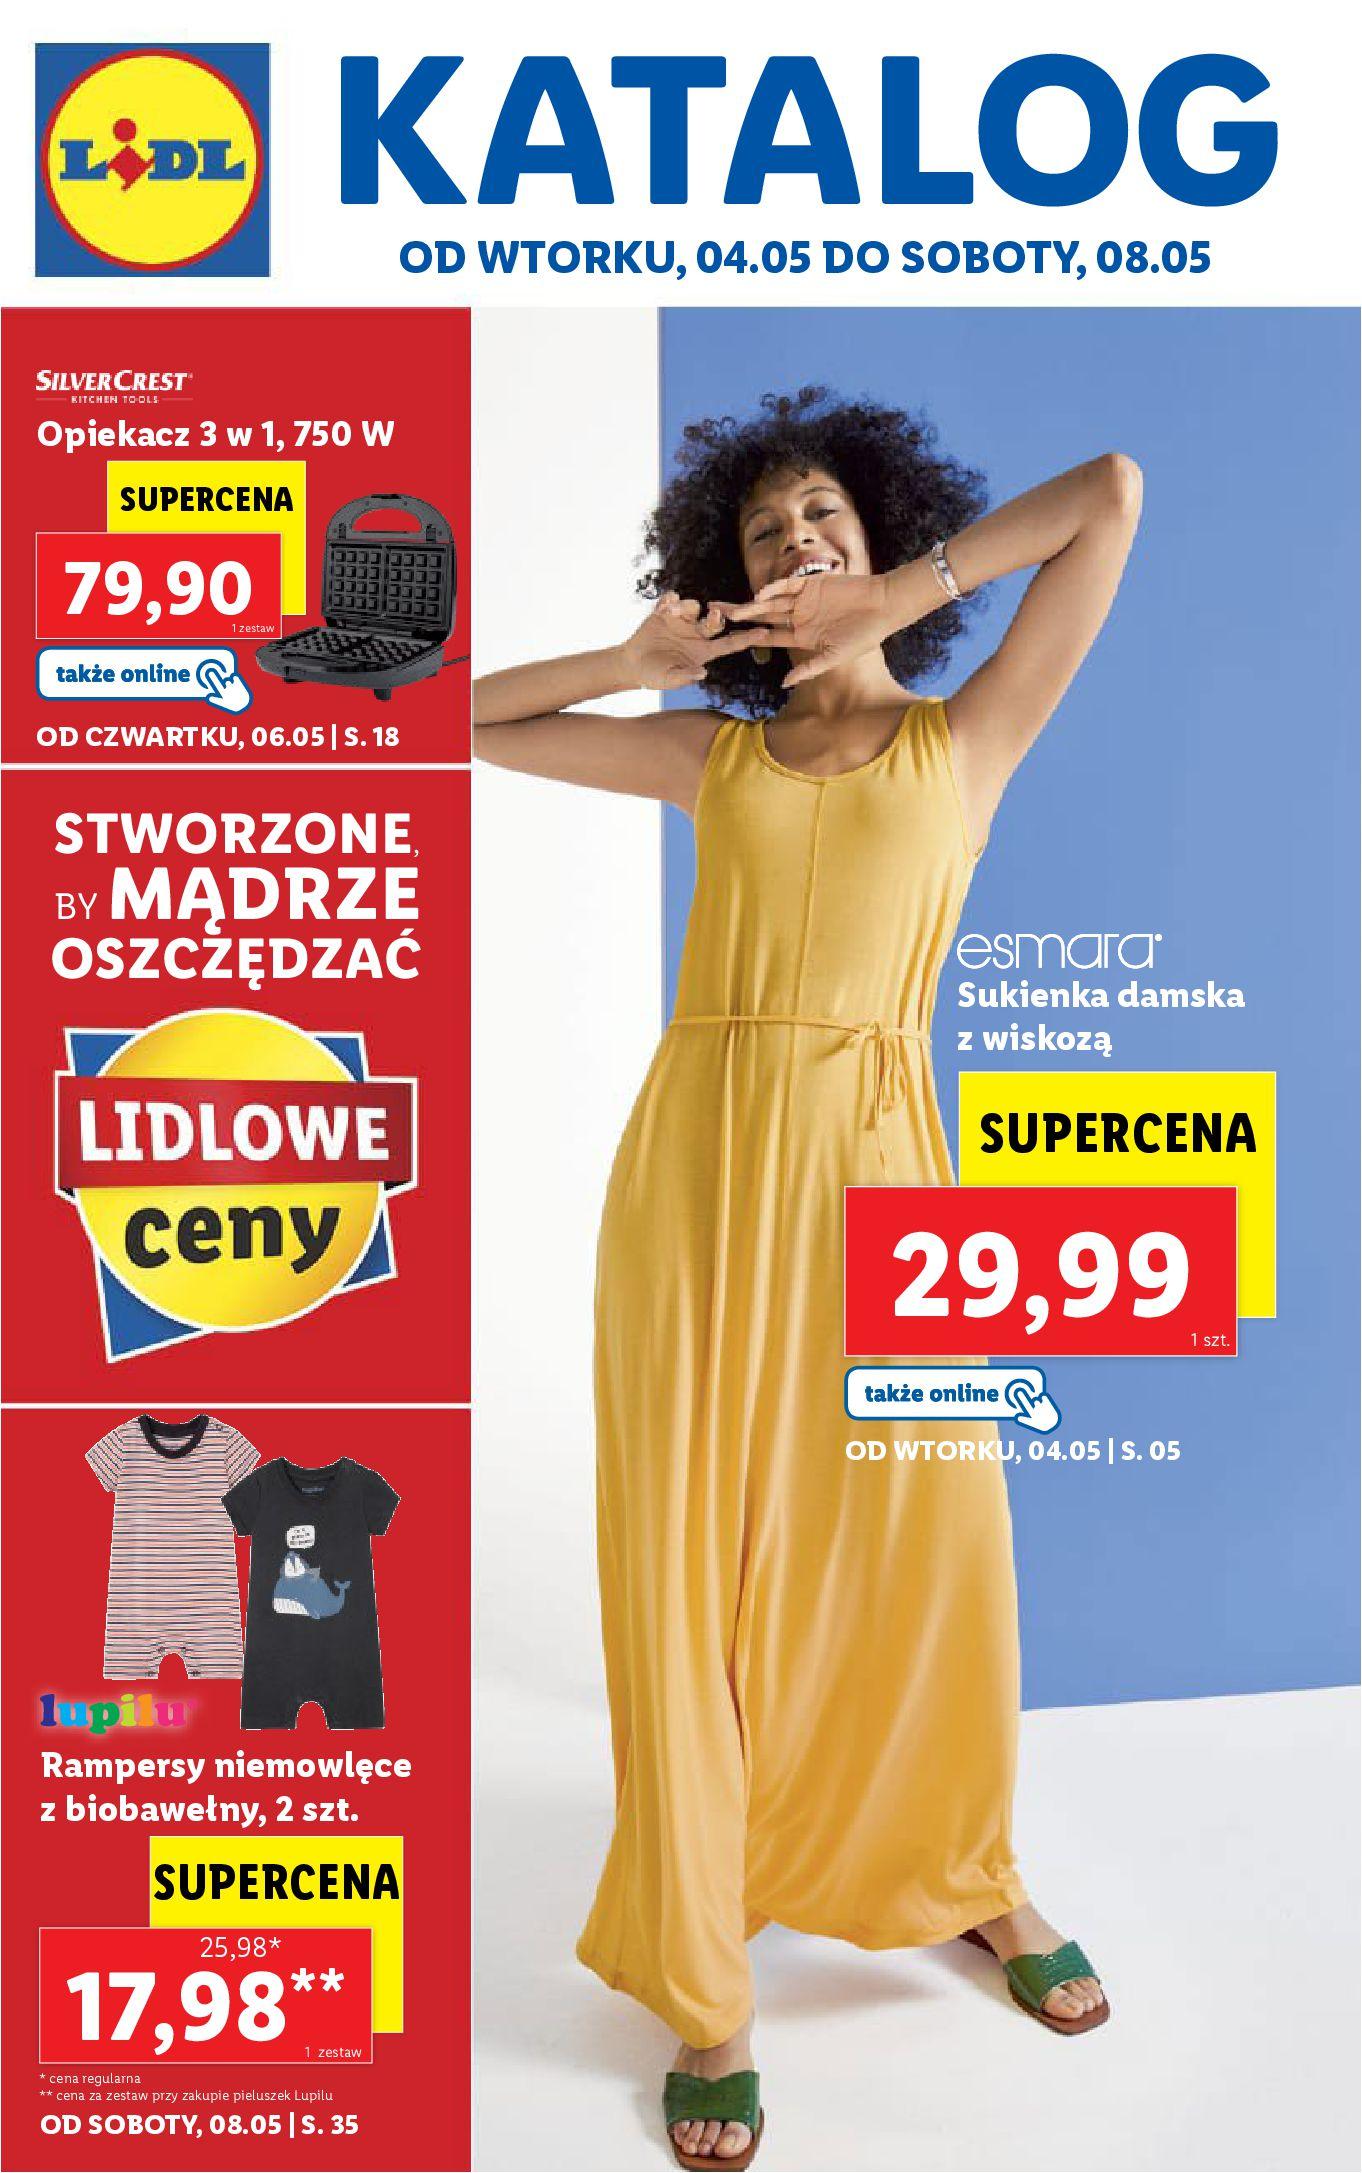 Gazetka Lidl: Katalog Lidl od 04.05 2021-05-04 page-1